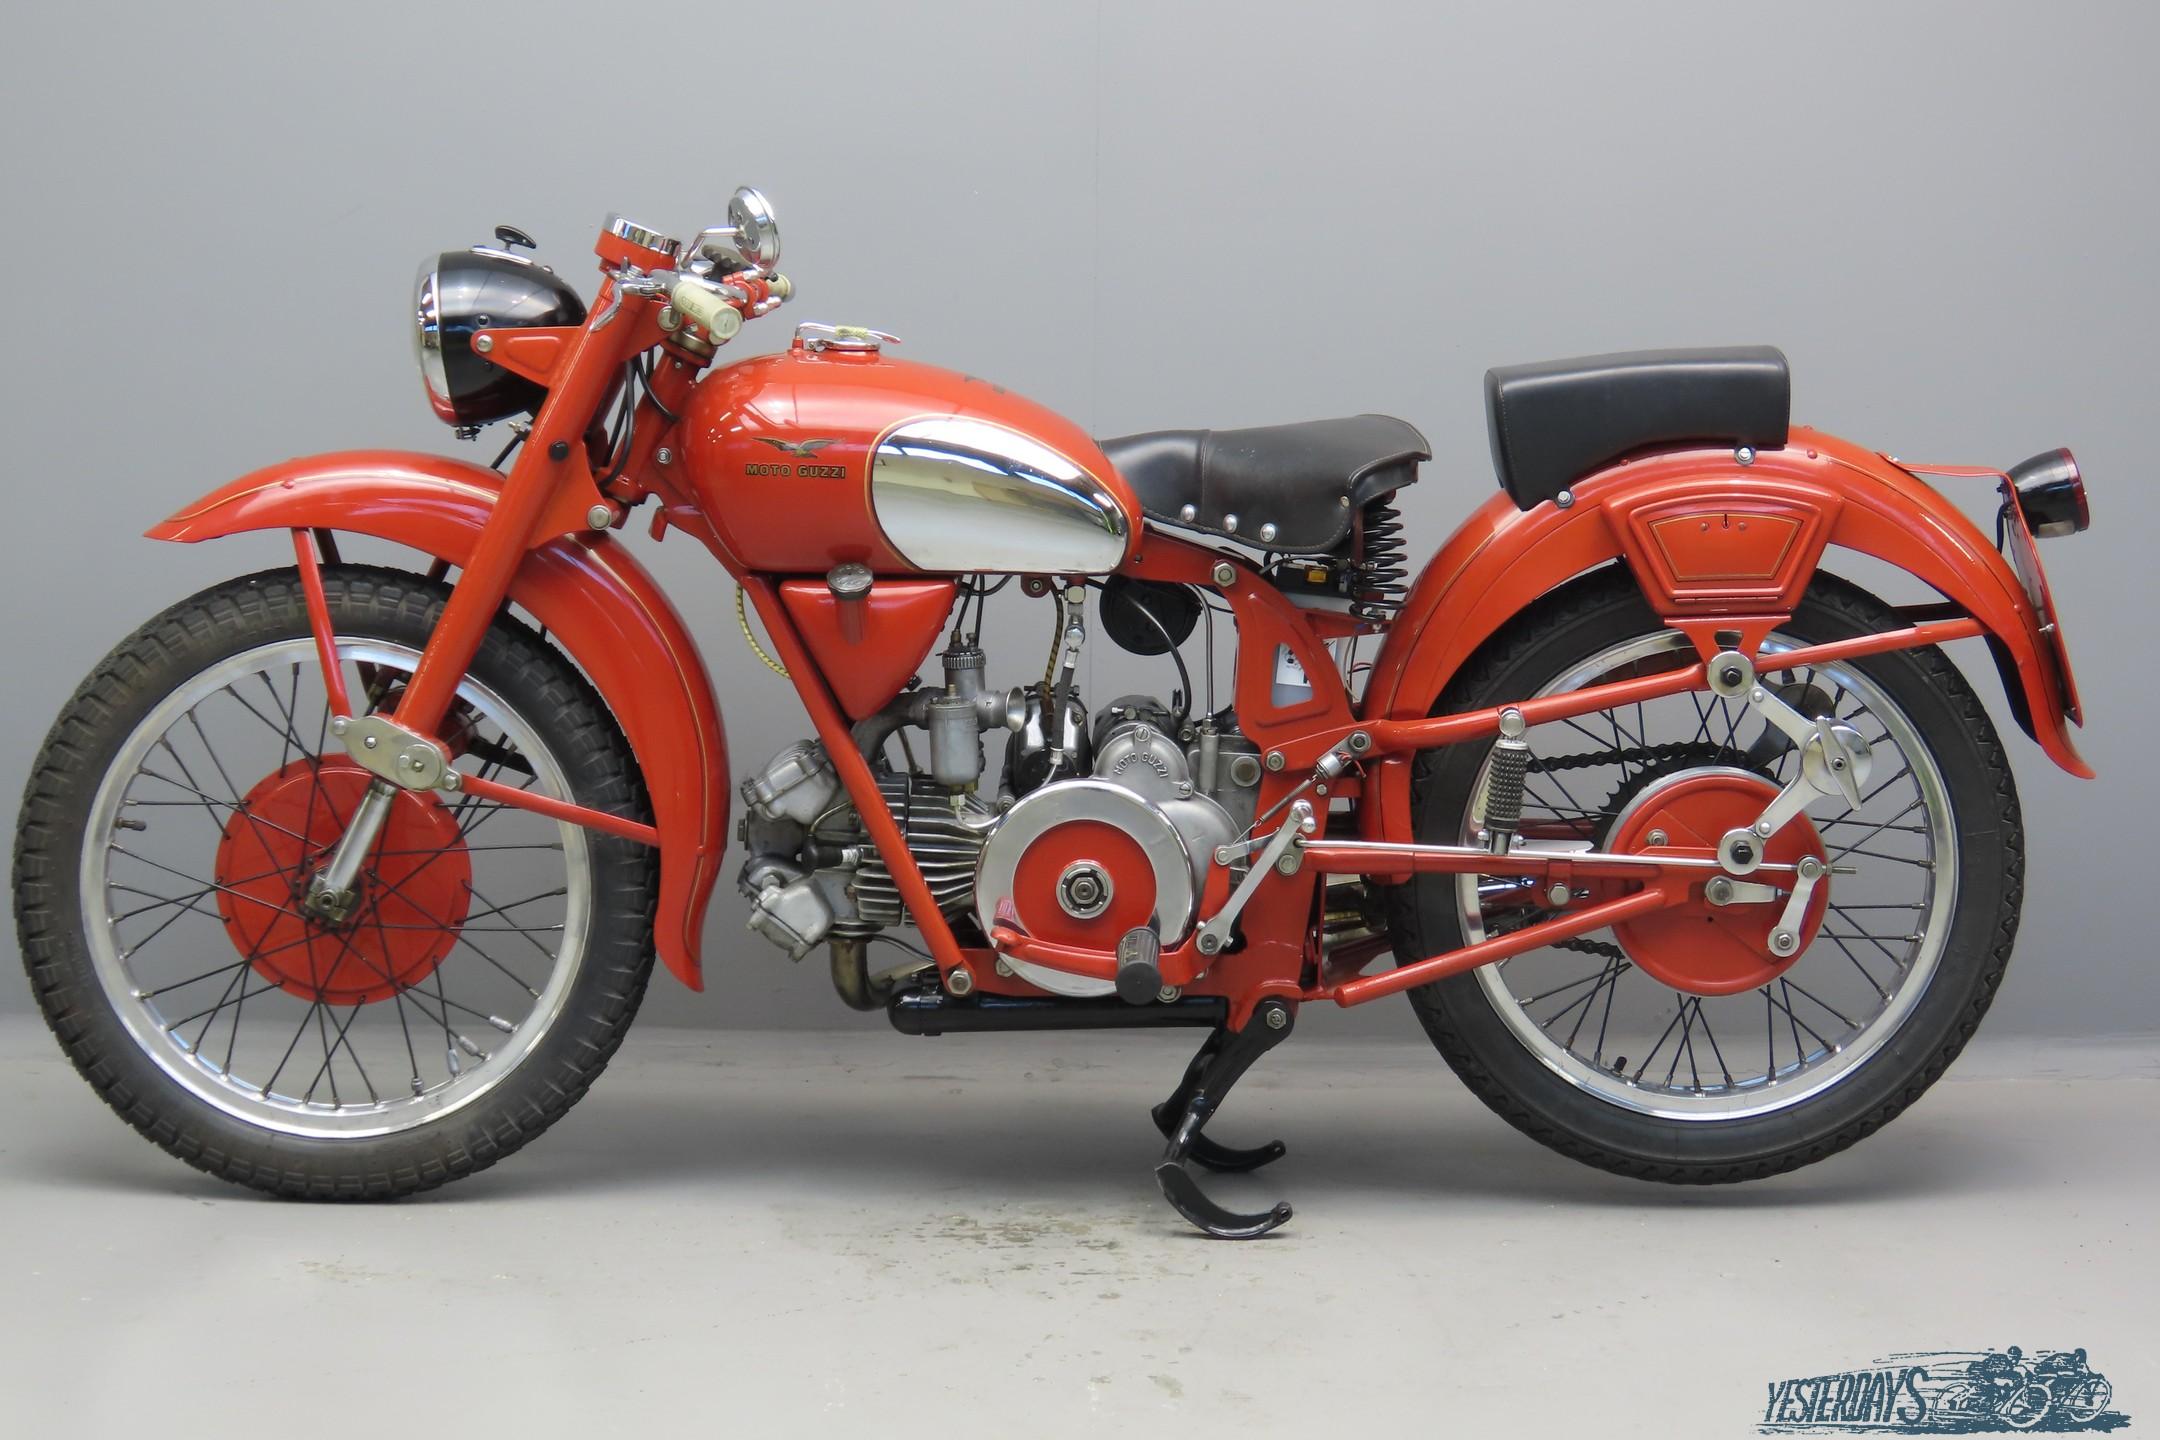 RM Sothebys - 1956 Moto Guzzi Falcone Sport | London 2011